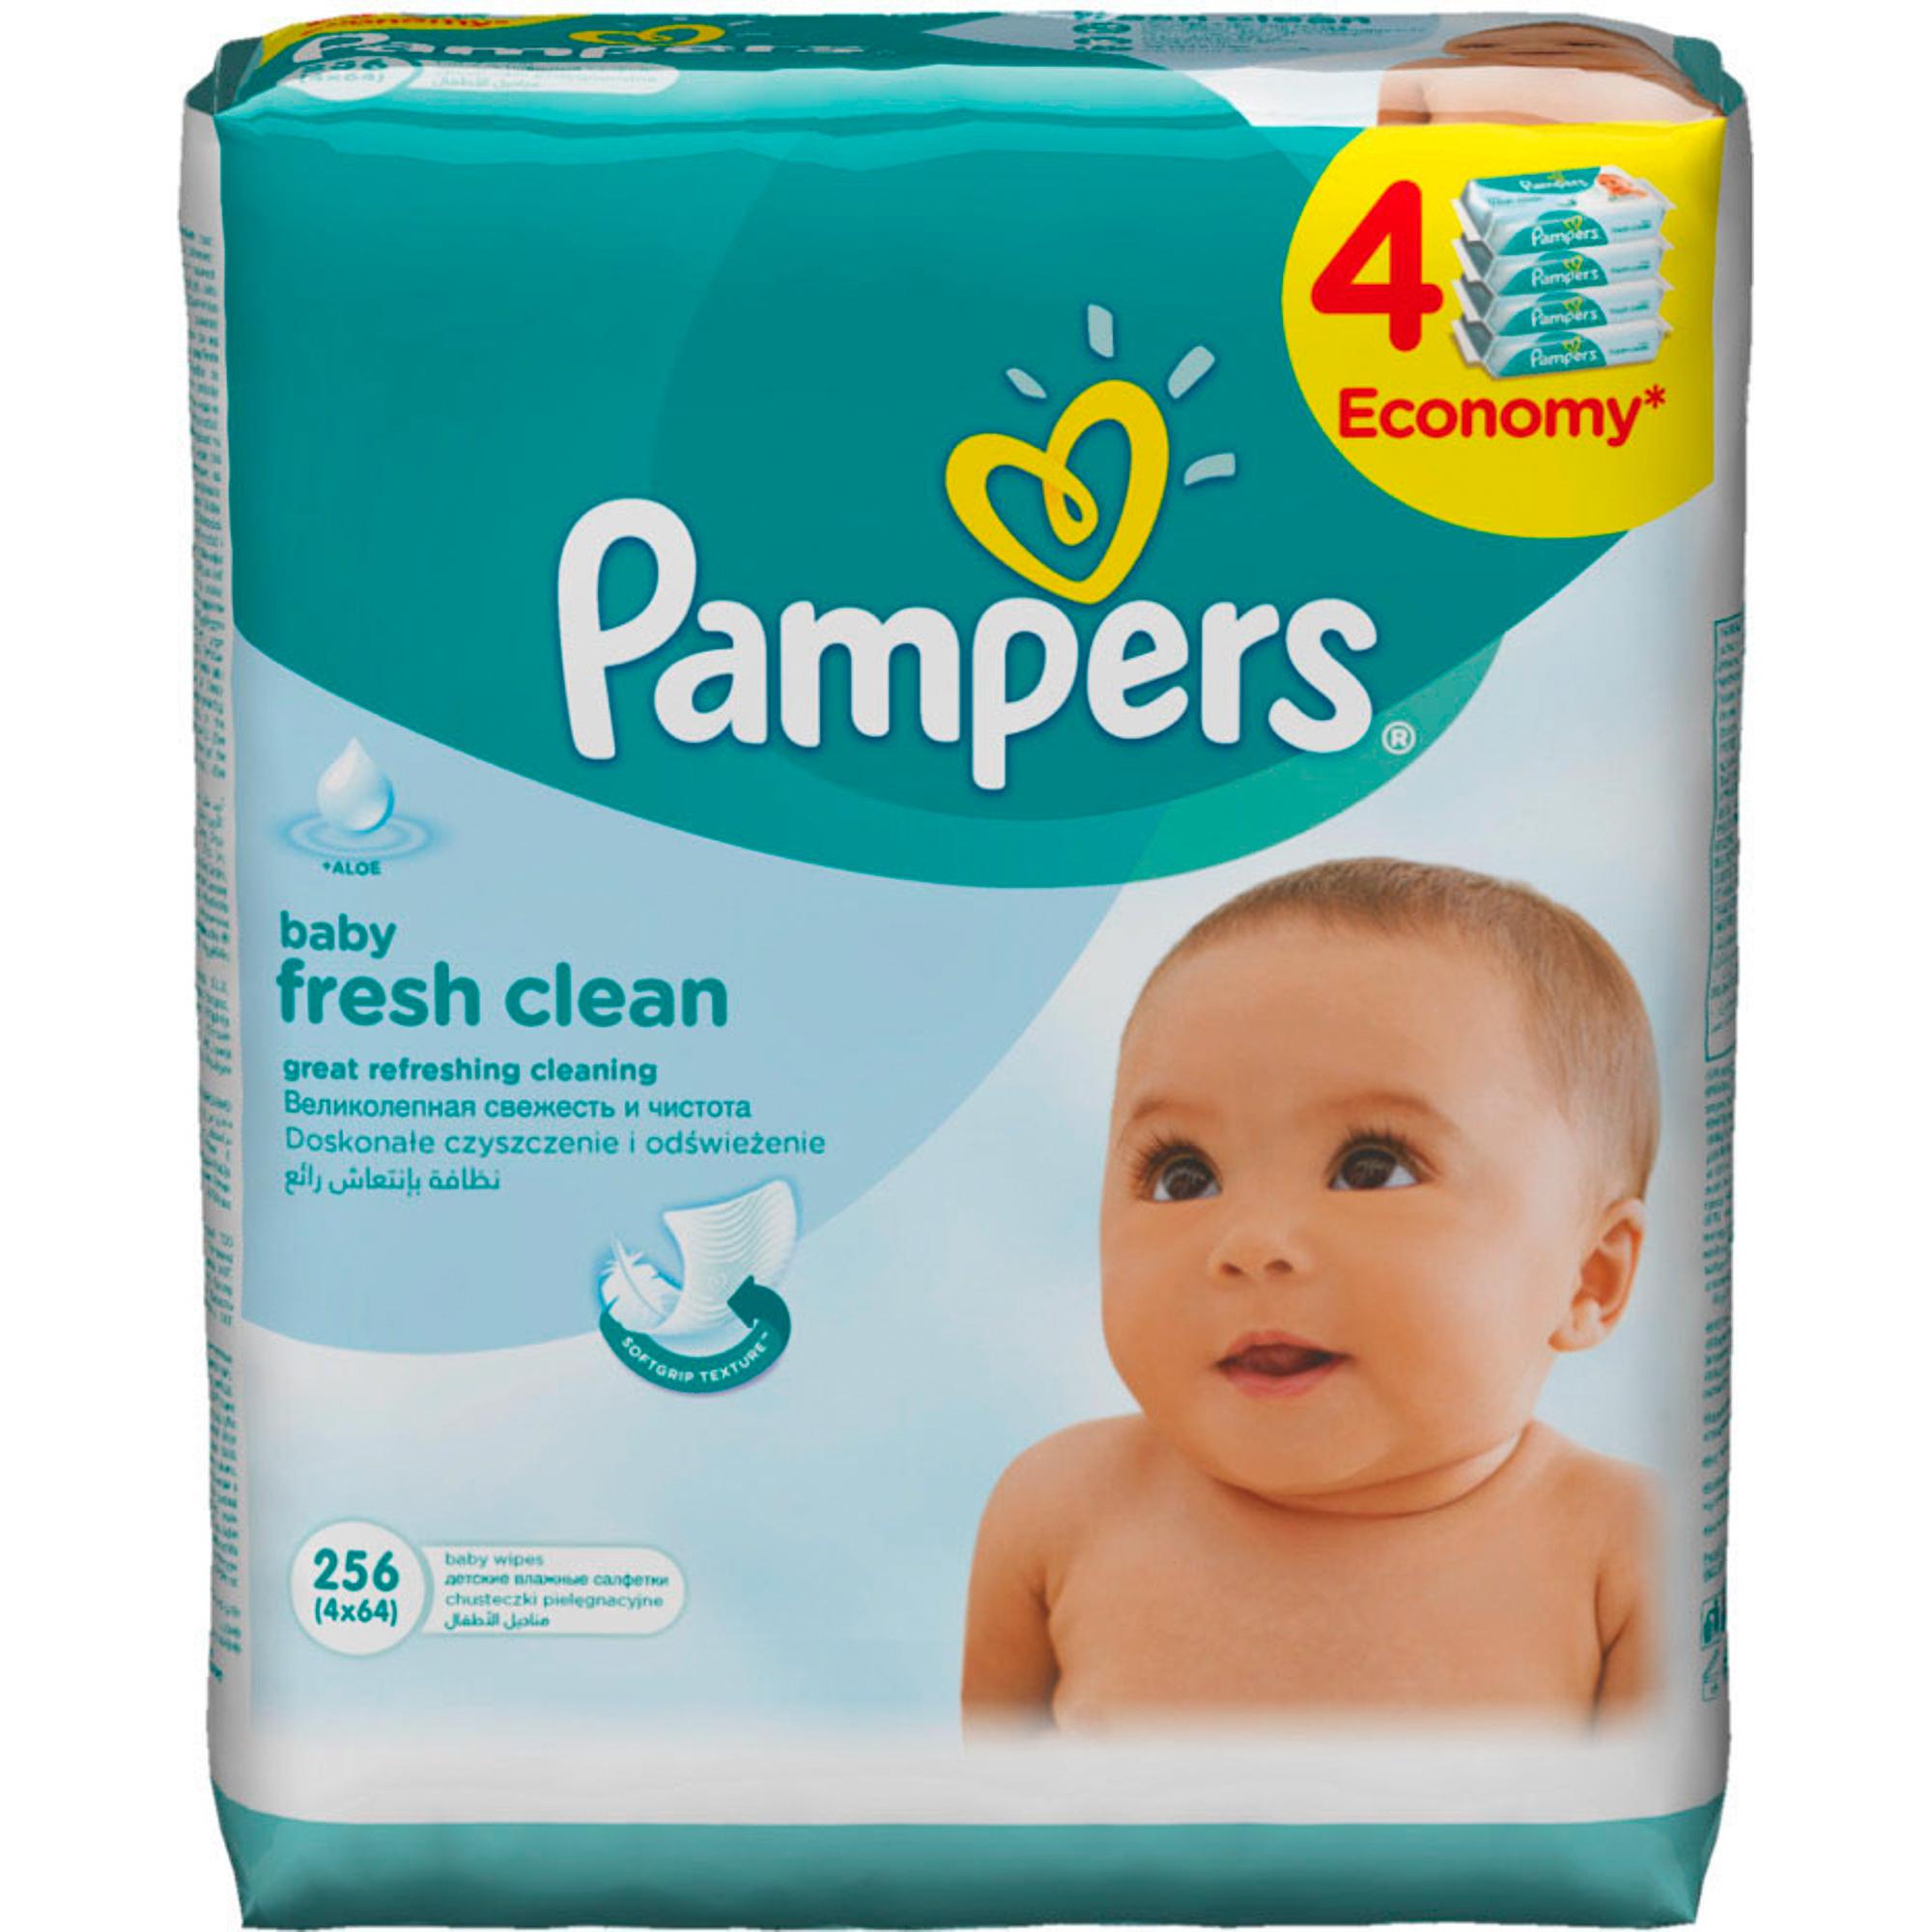 Фото - Салфетки влажные Pampers Fresh Clean 4x64 шт салфетки pampers детские влажные салфетки sensitive 104 шт